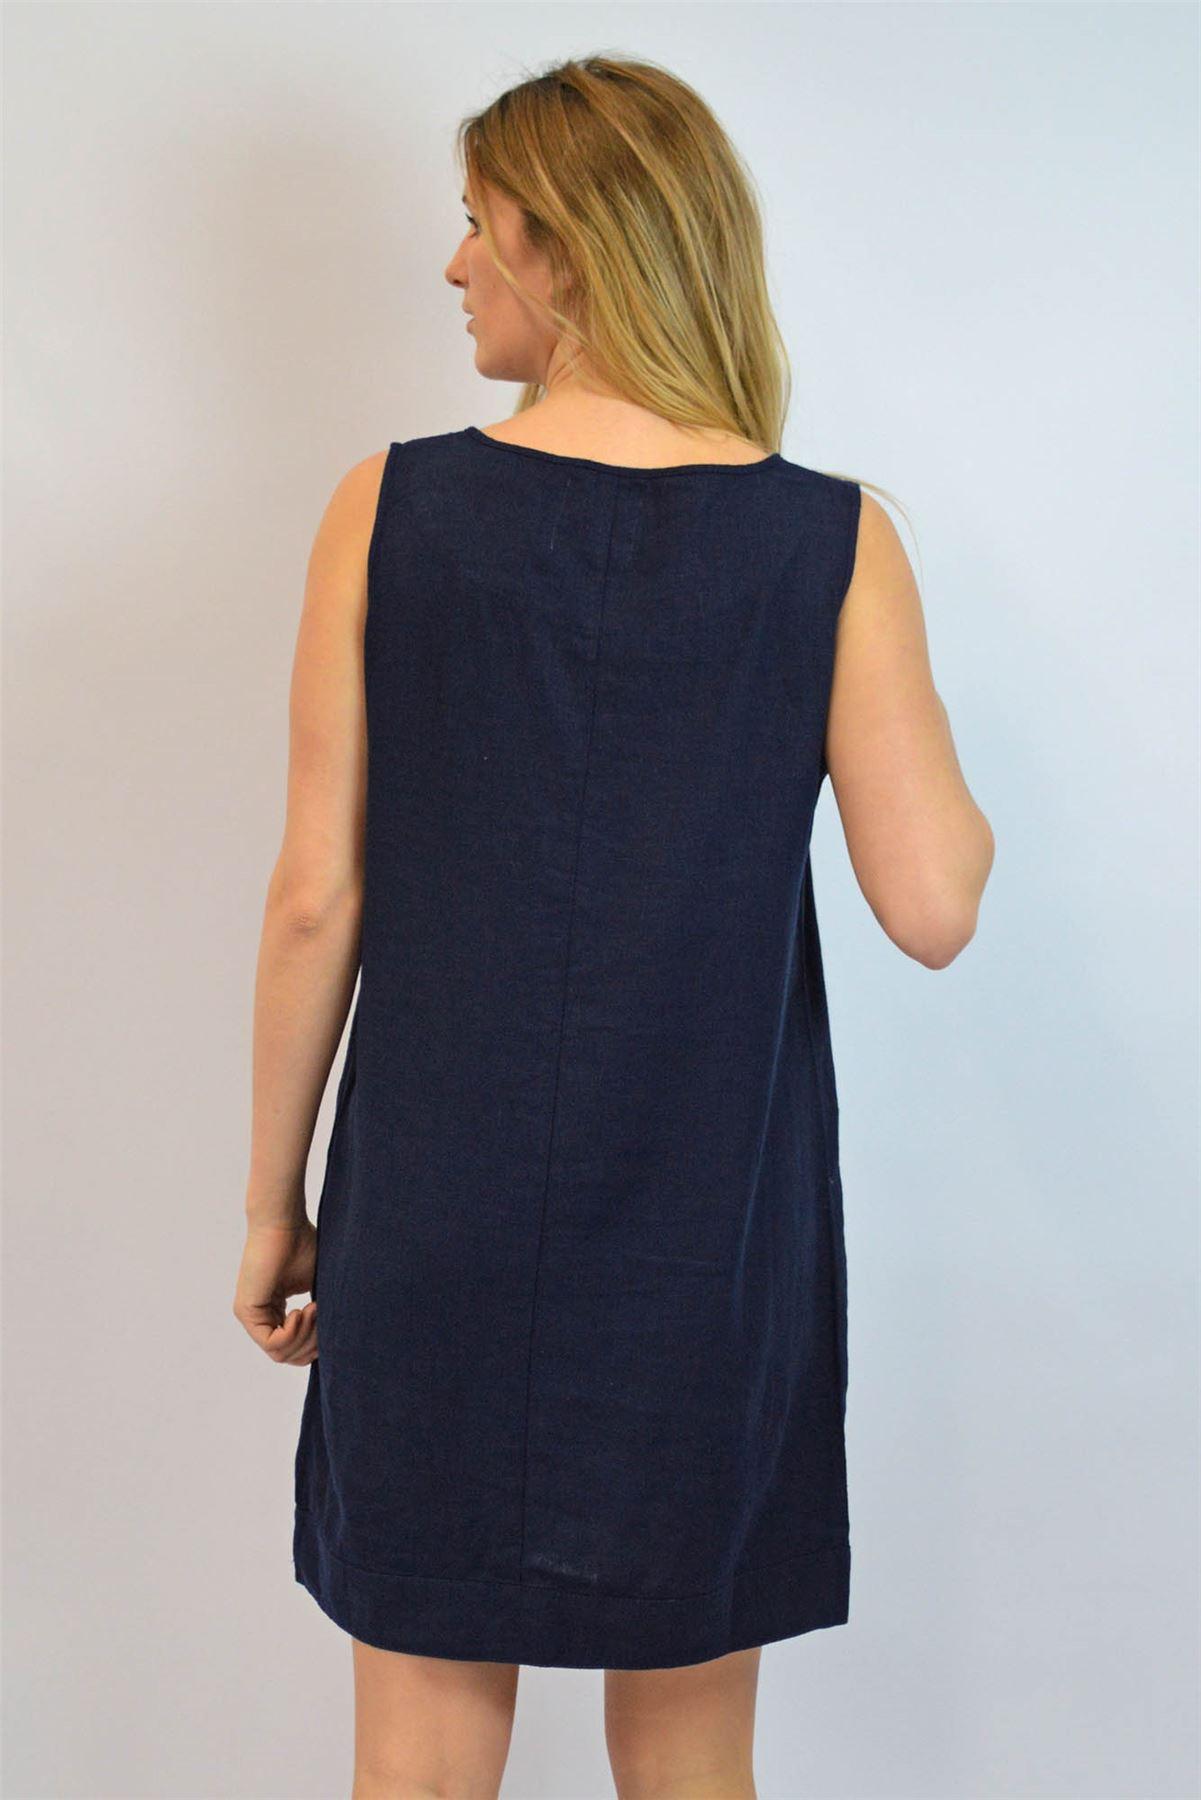 b8d3d197e73 Classic Box Shaped Tunic Dress ex NEXT Round Neck Sleeveless RRP £25 ...